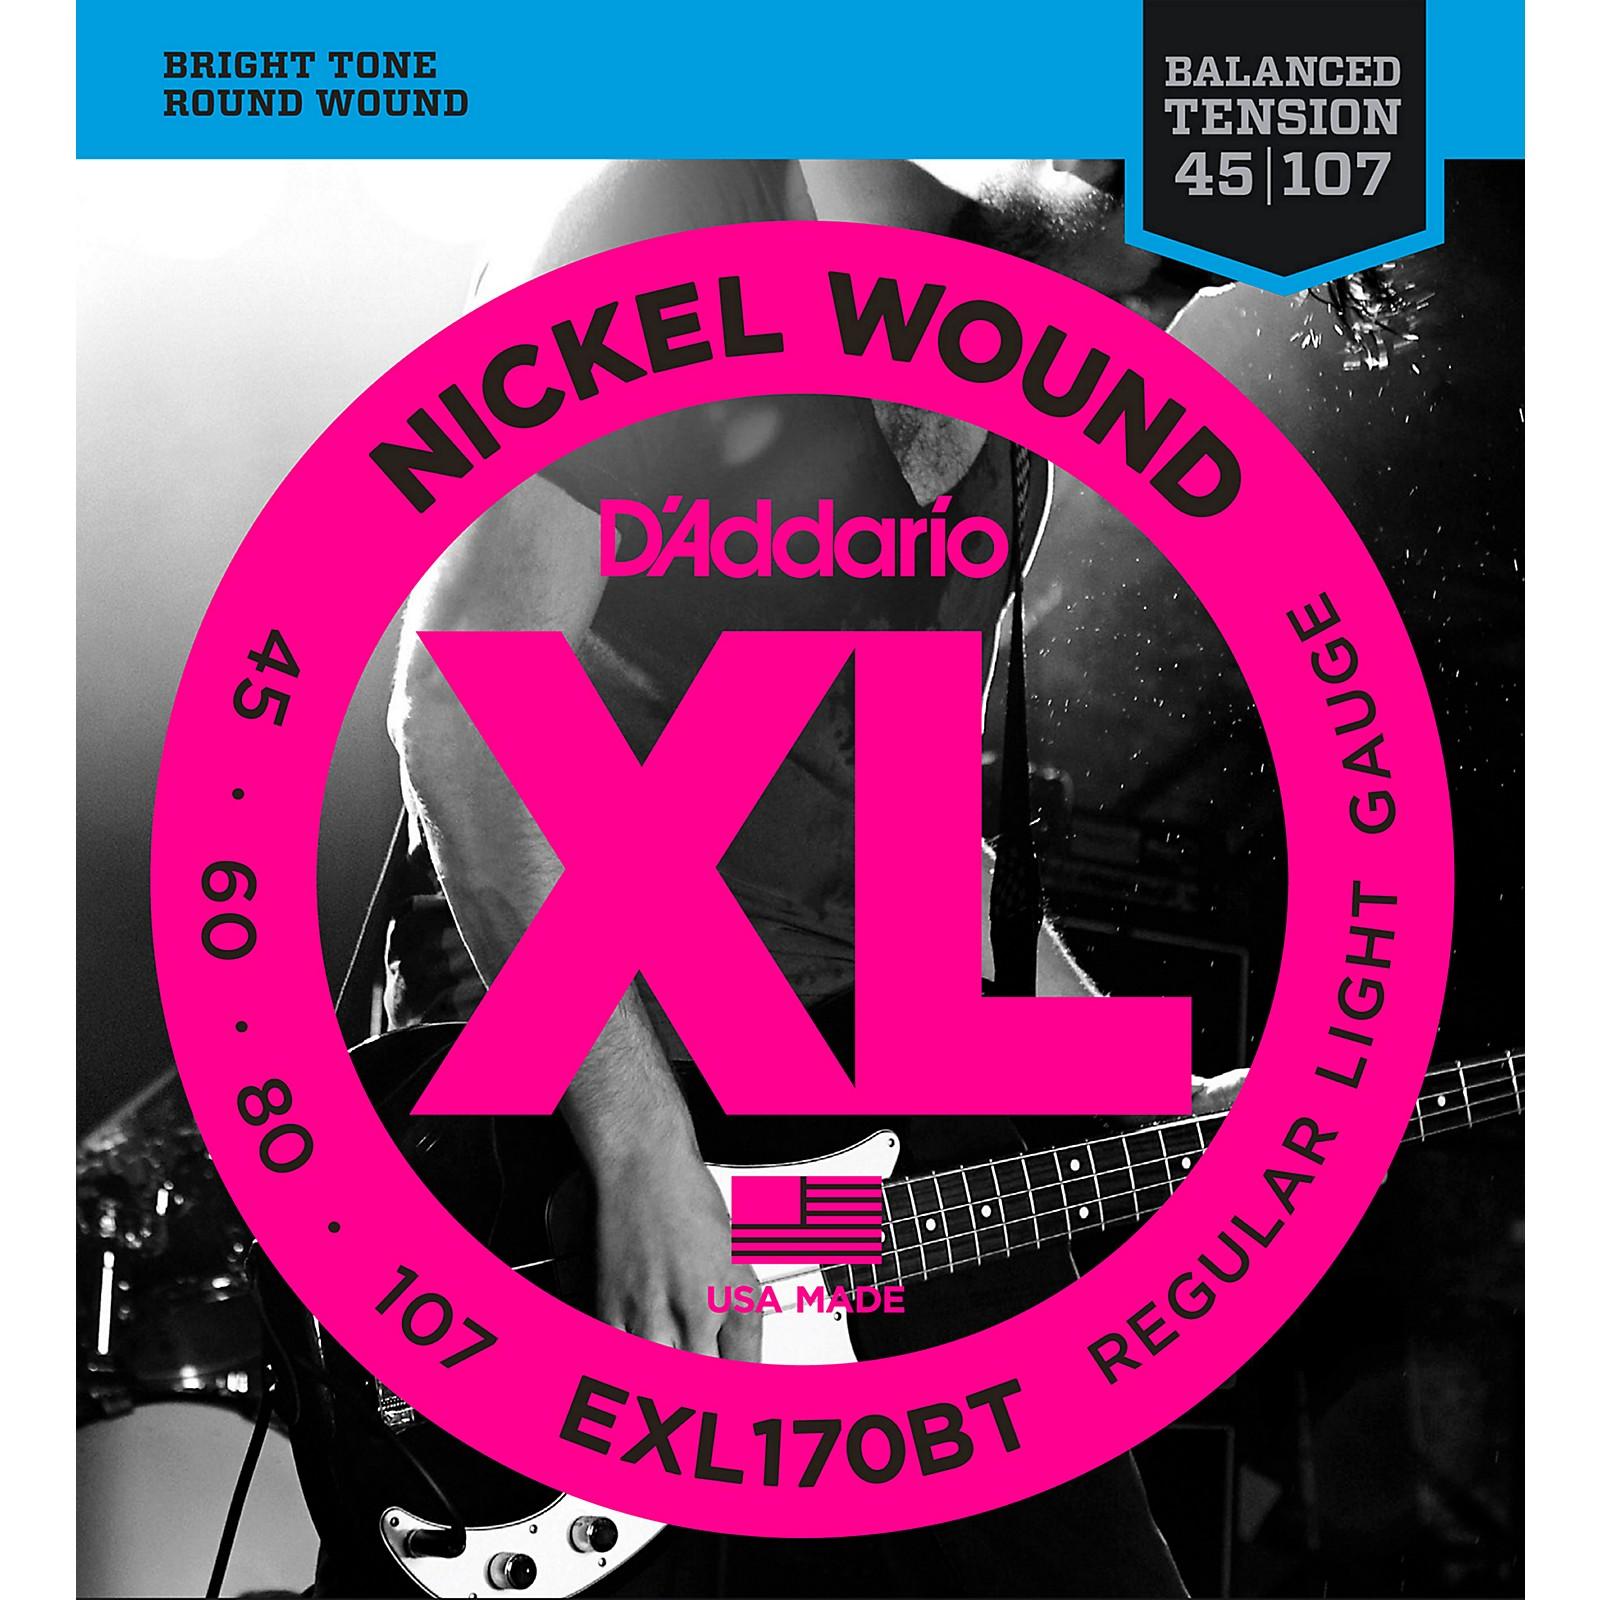 D'Addario EXL170BT Balanced Tension 45-107 Long Scale Electric Bass String Set